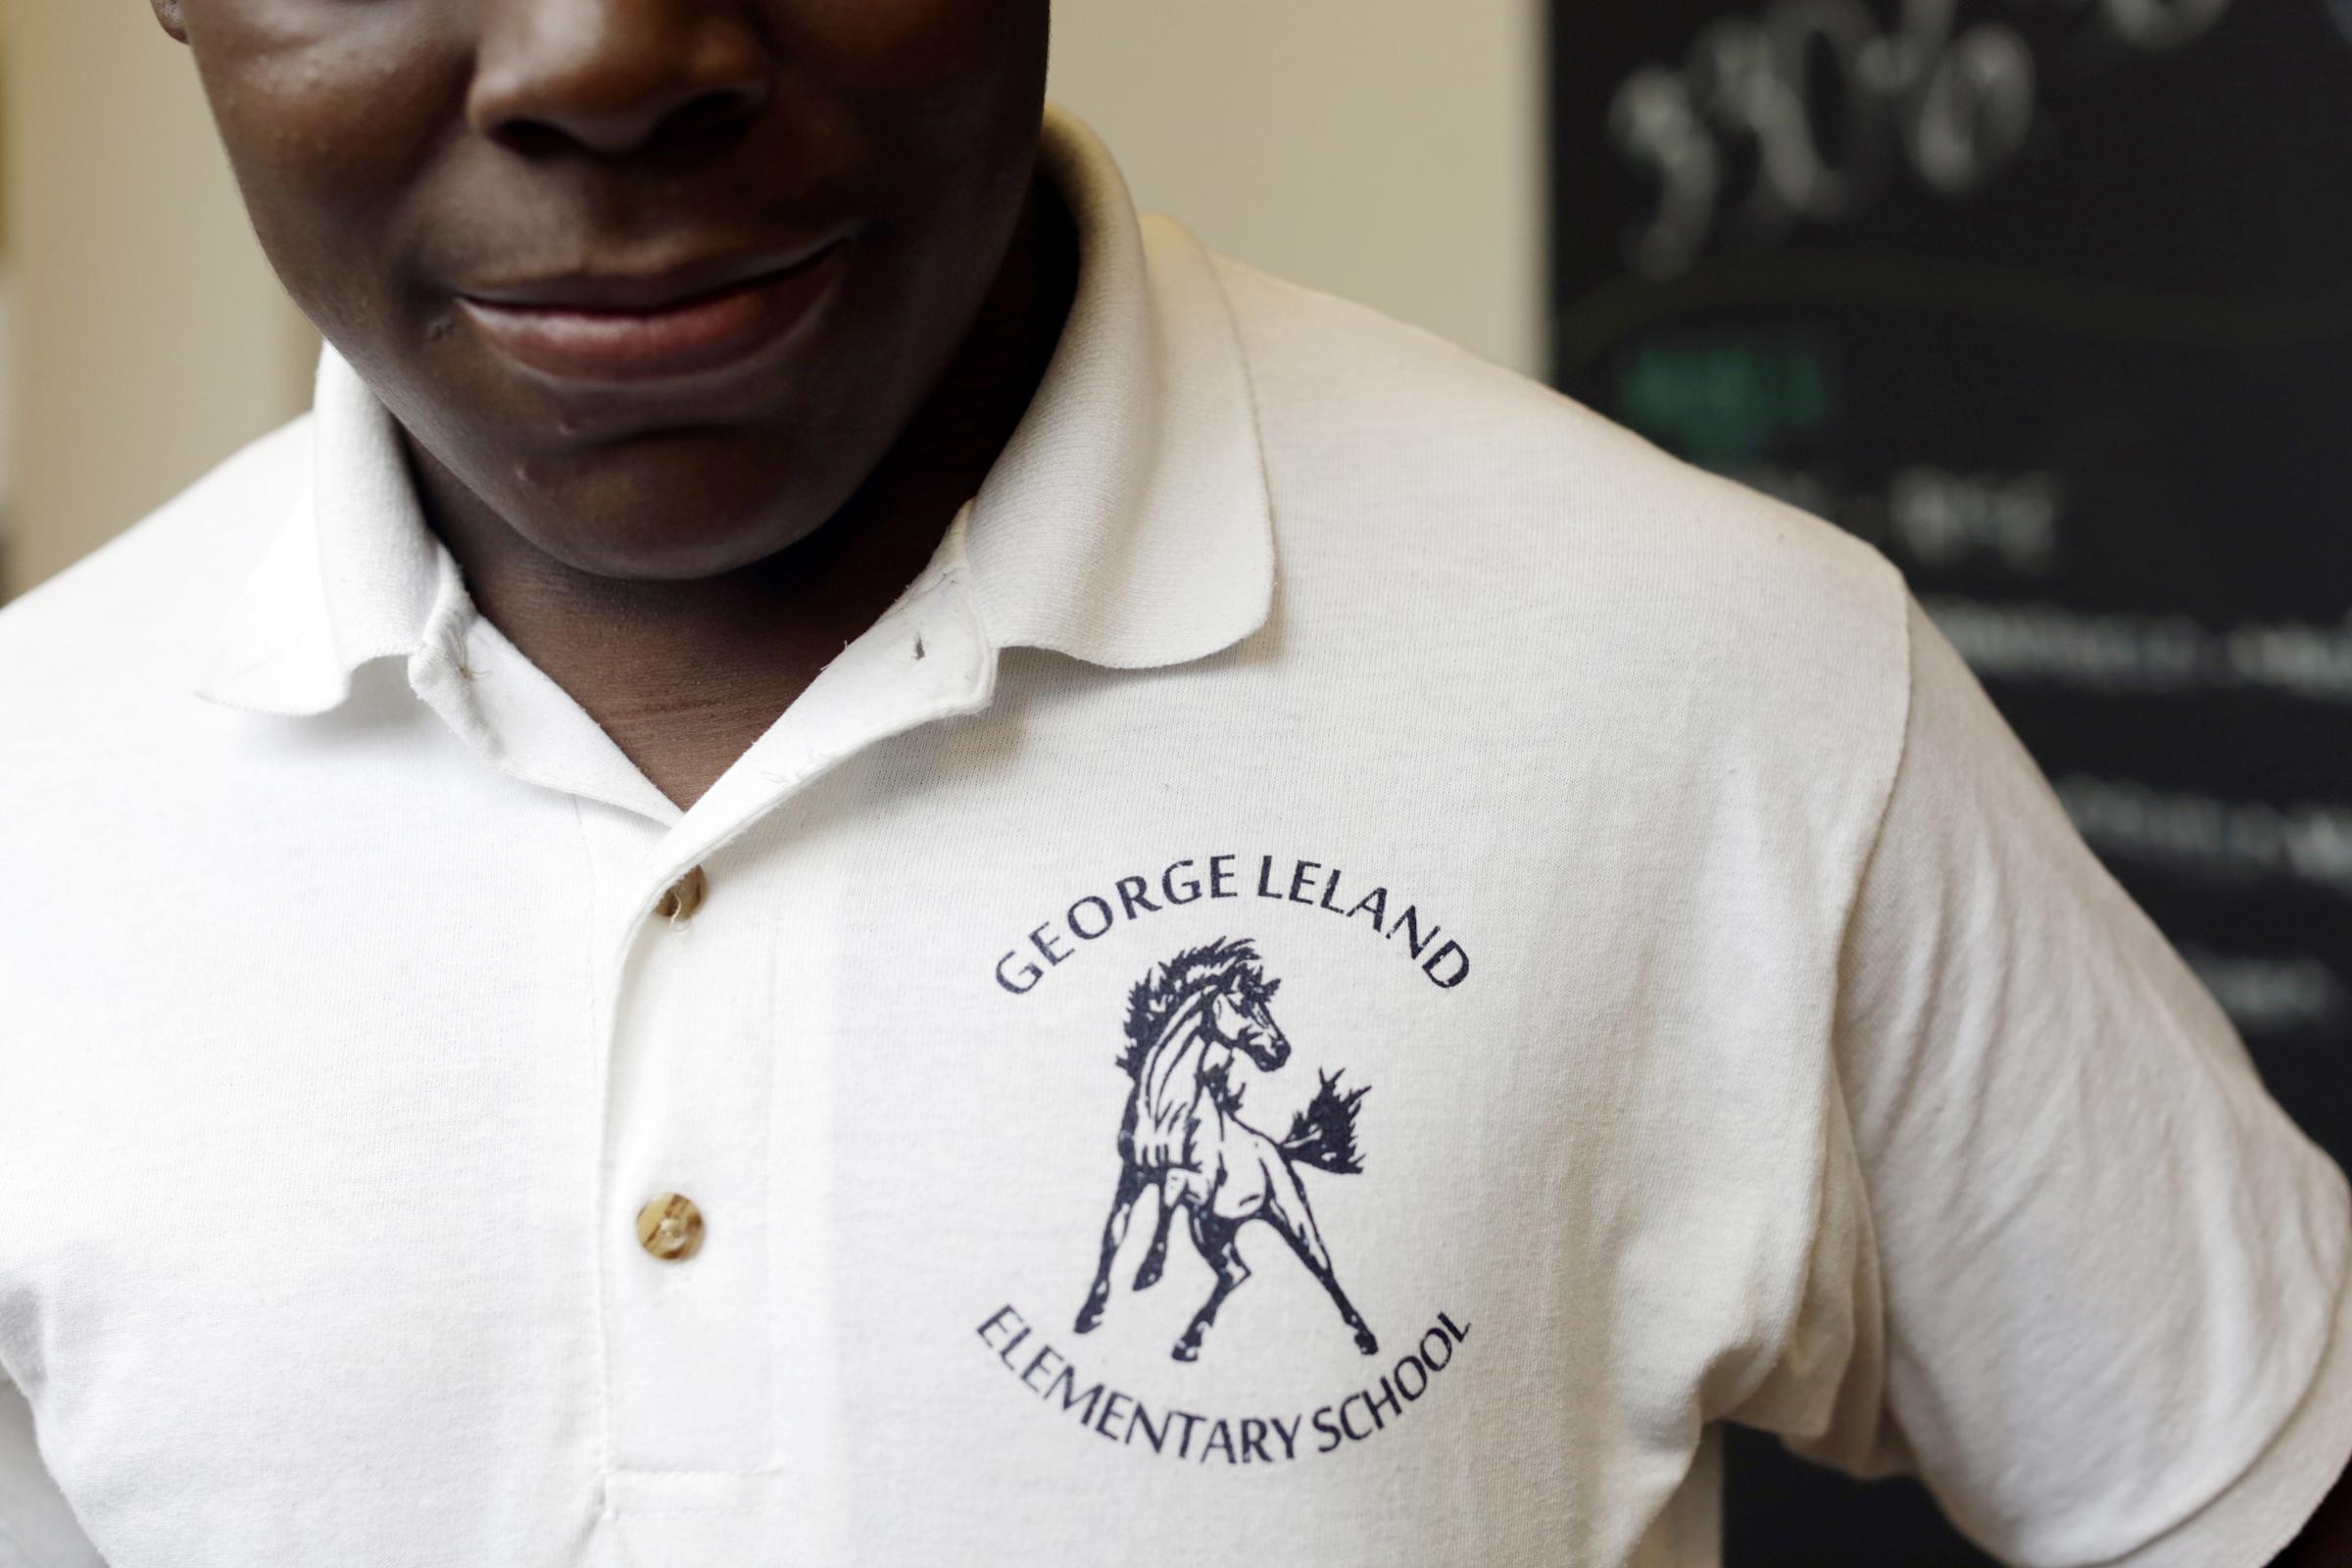 Student Daquian Denton wears a school uniform, a white polo with the logo of George Leland Elementary School.